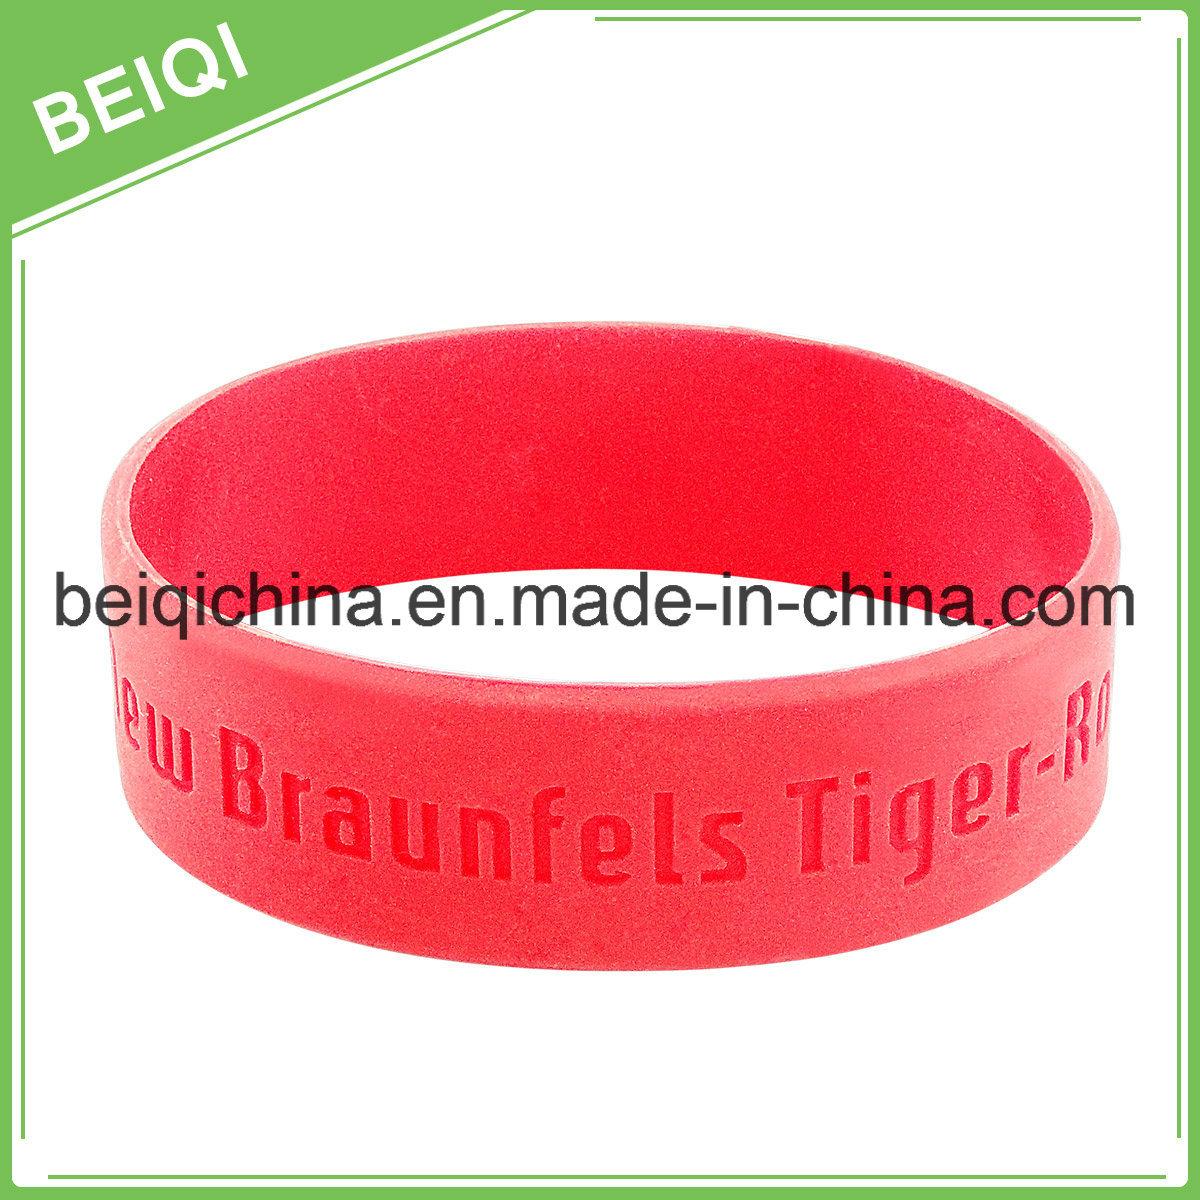 Customized Silicone Bracelet for Promotion